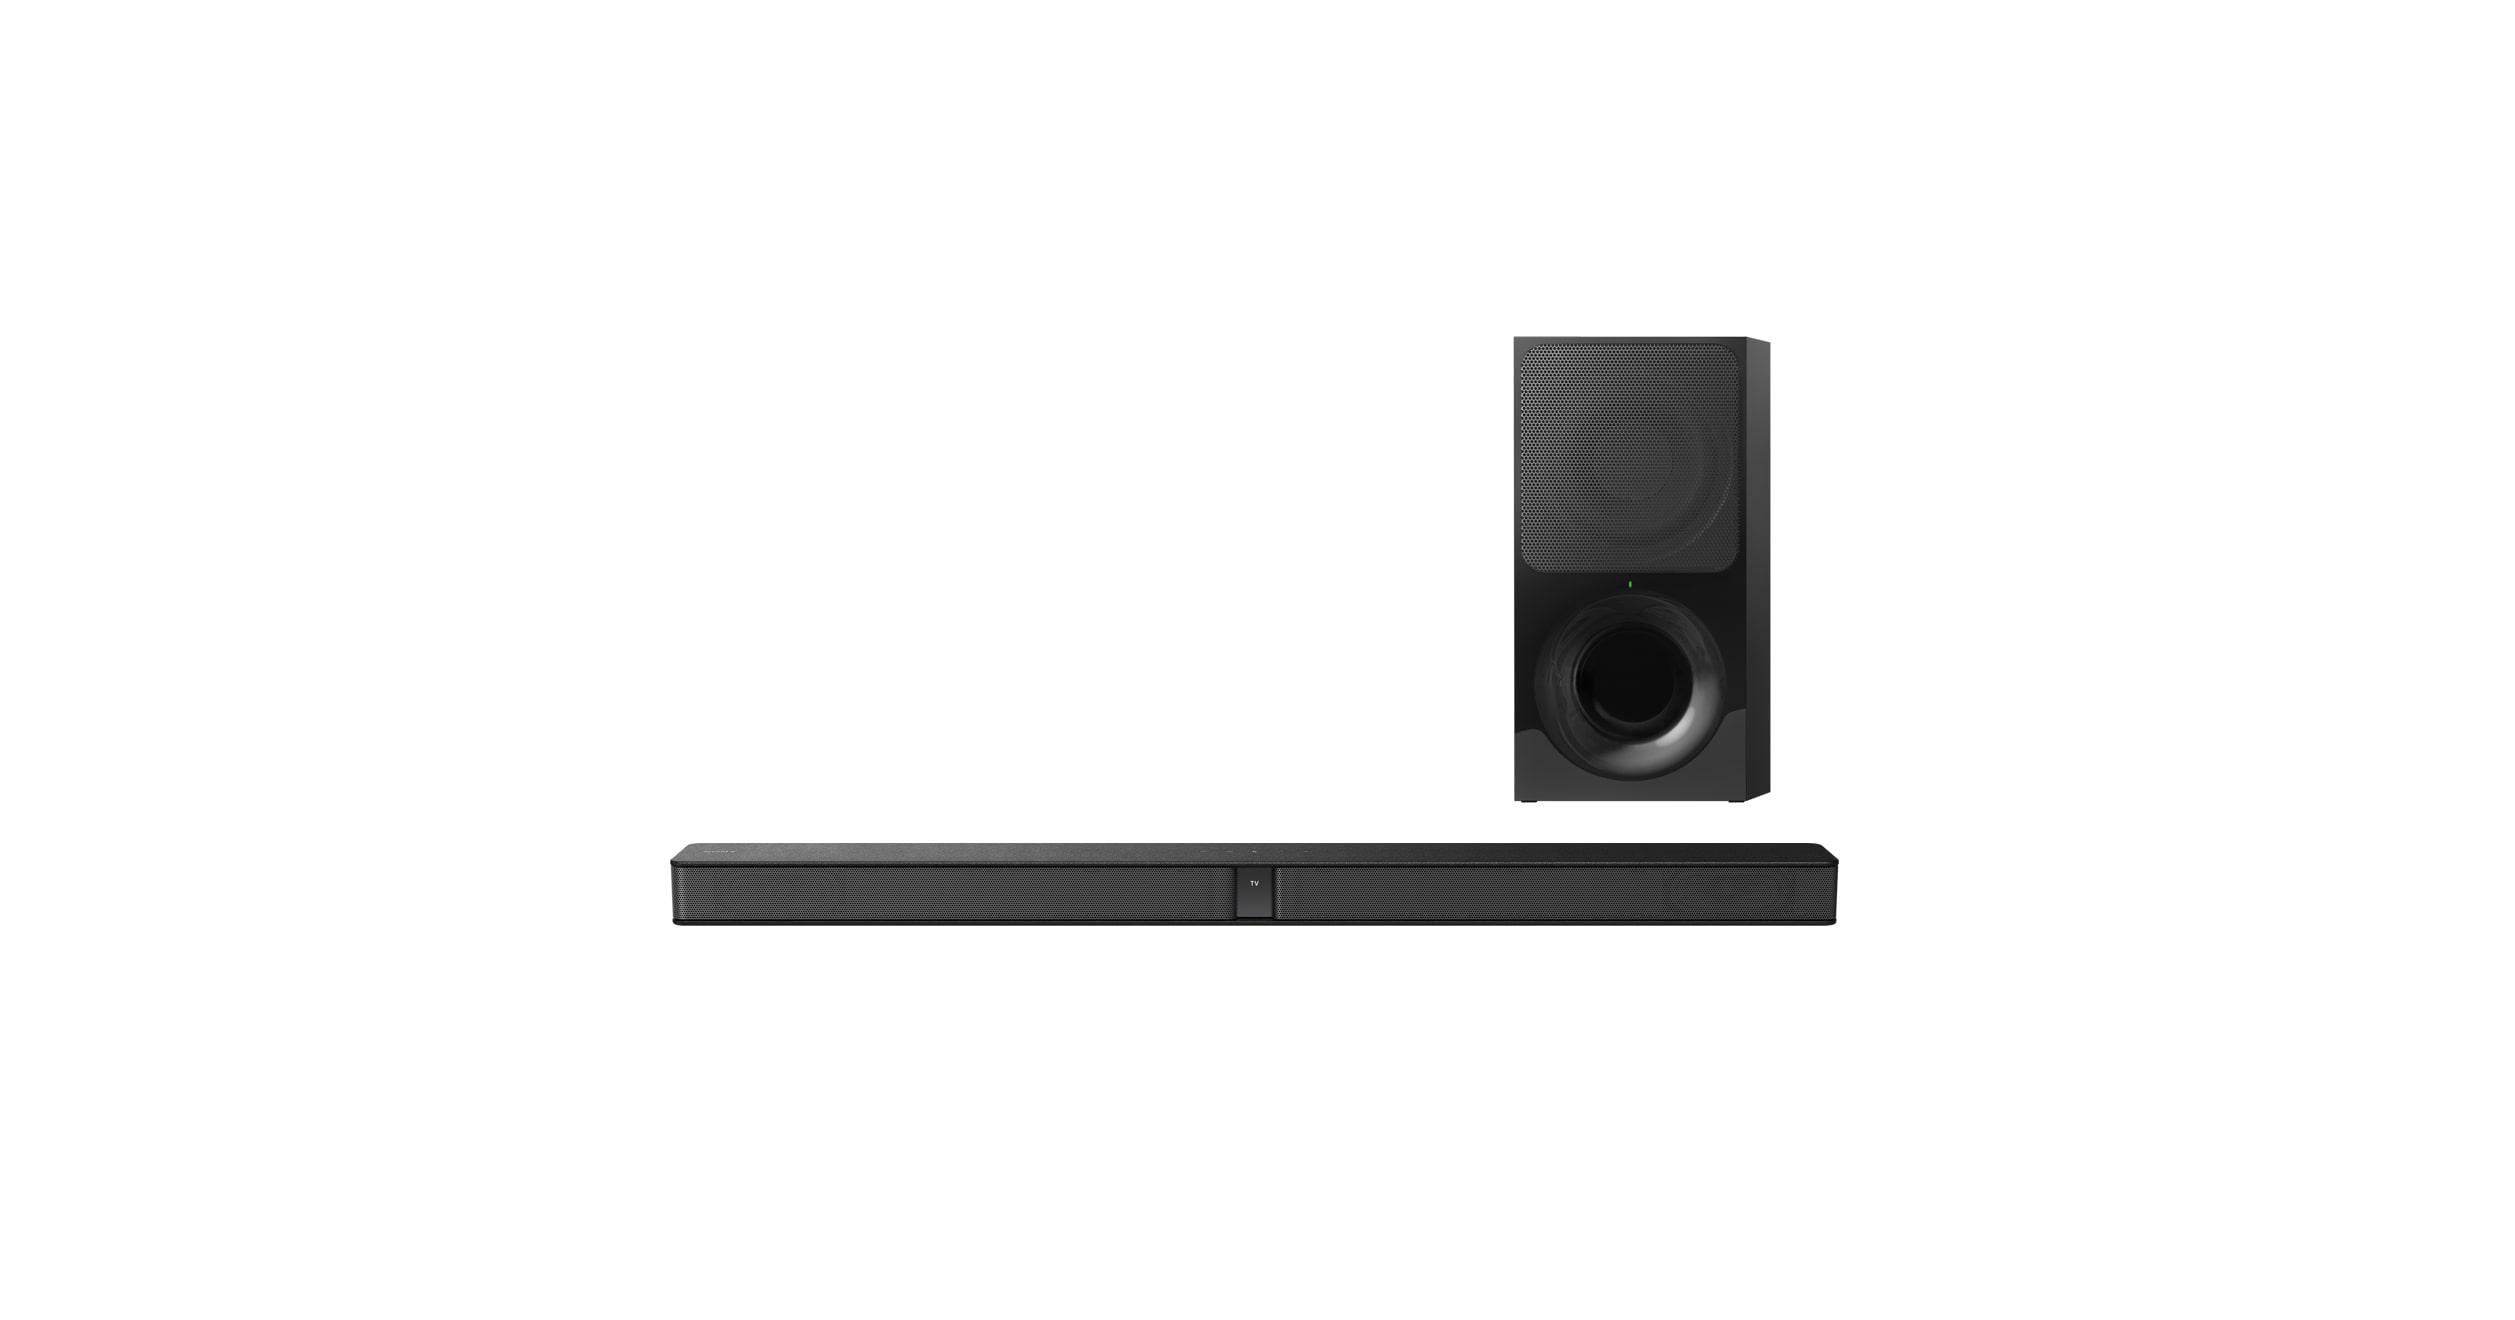 HT-CT290   2.1ch Soundbar with Bluetooth   Sony UK